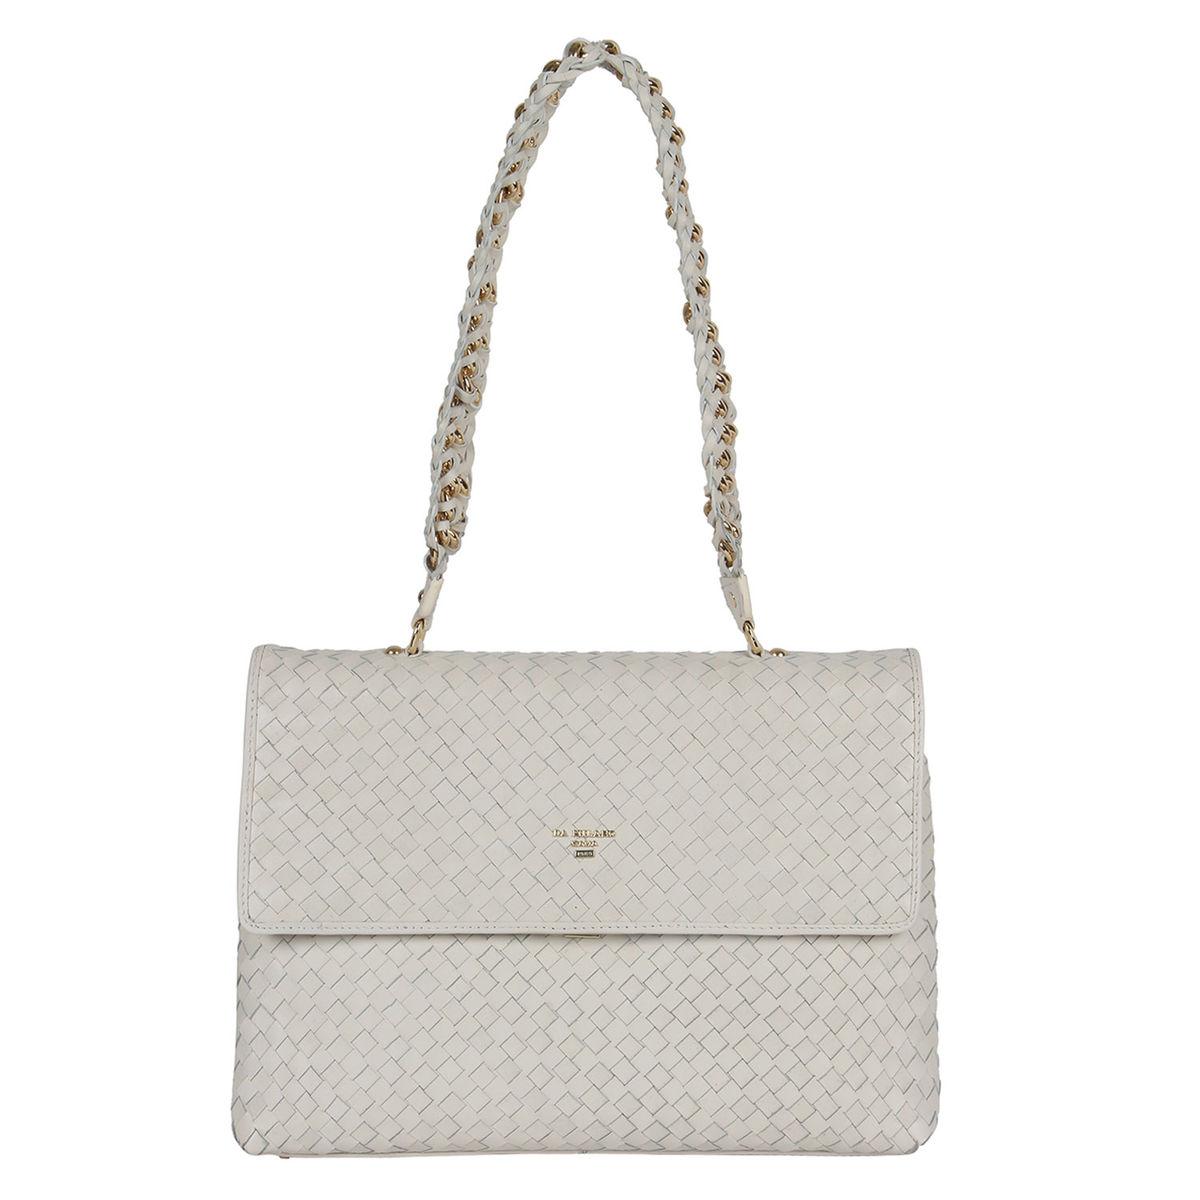 e62b9ecc97 ... Da Milano White Long Handle Bag. sold-out-image zoom Da ...